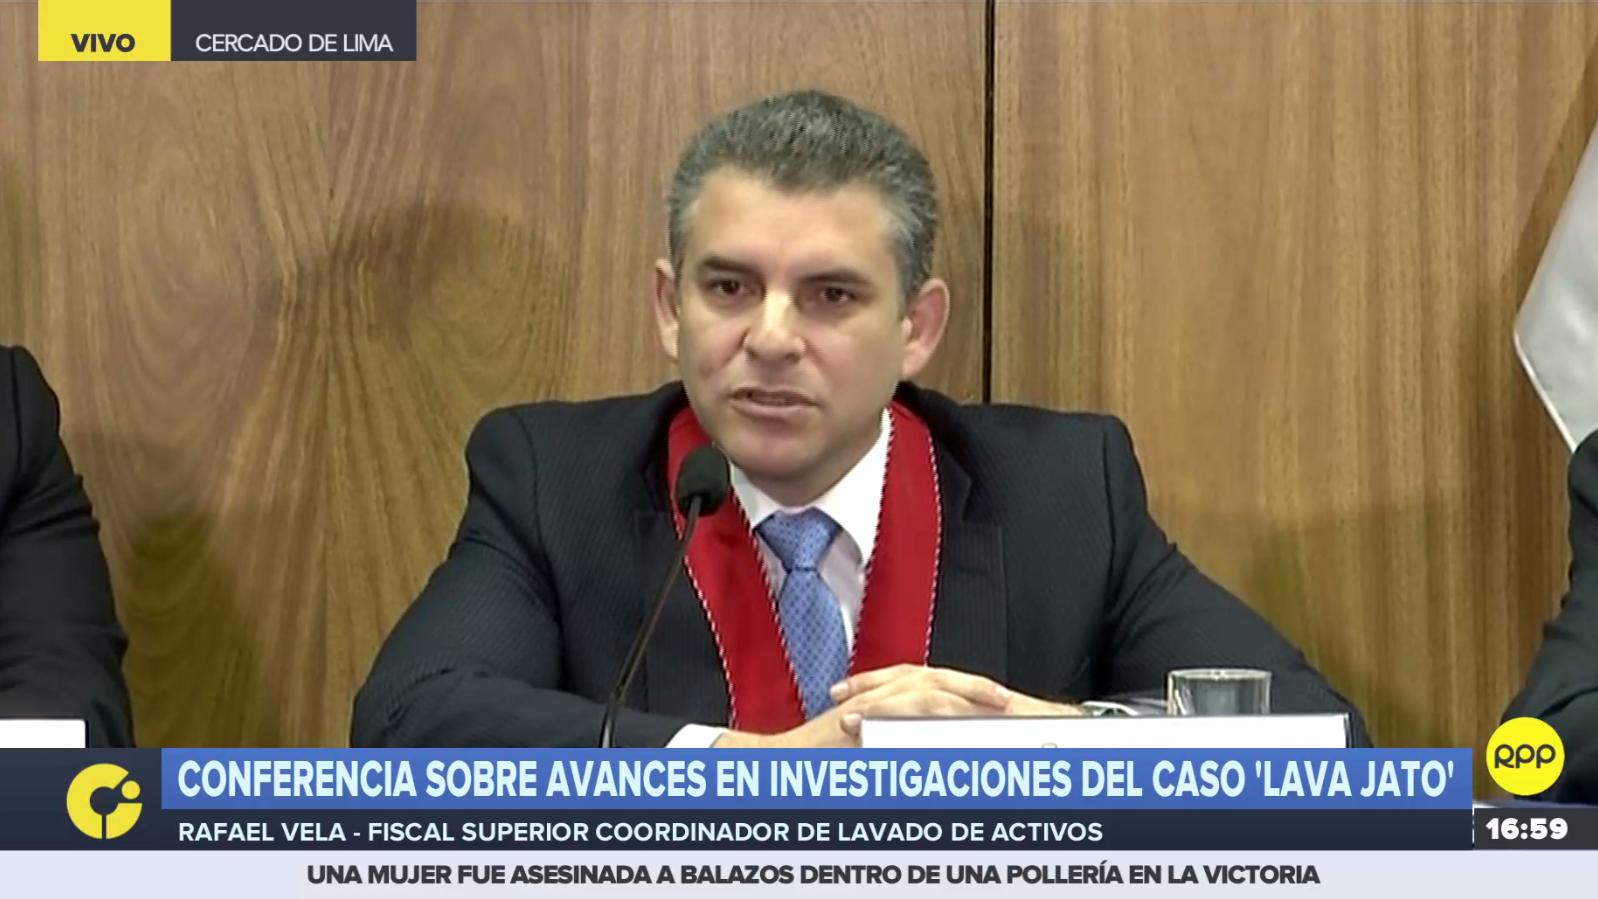 Fiscal Rafael Vela informó de avances en investigación del caso Lava Jato.